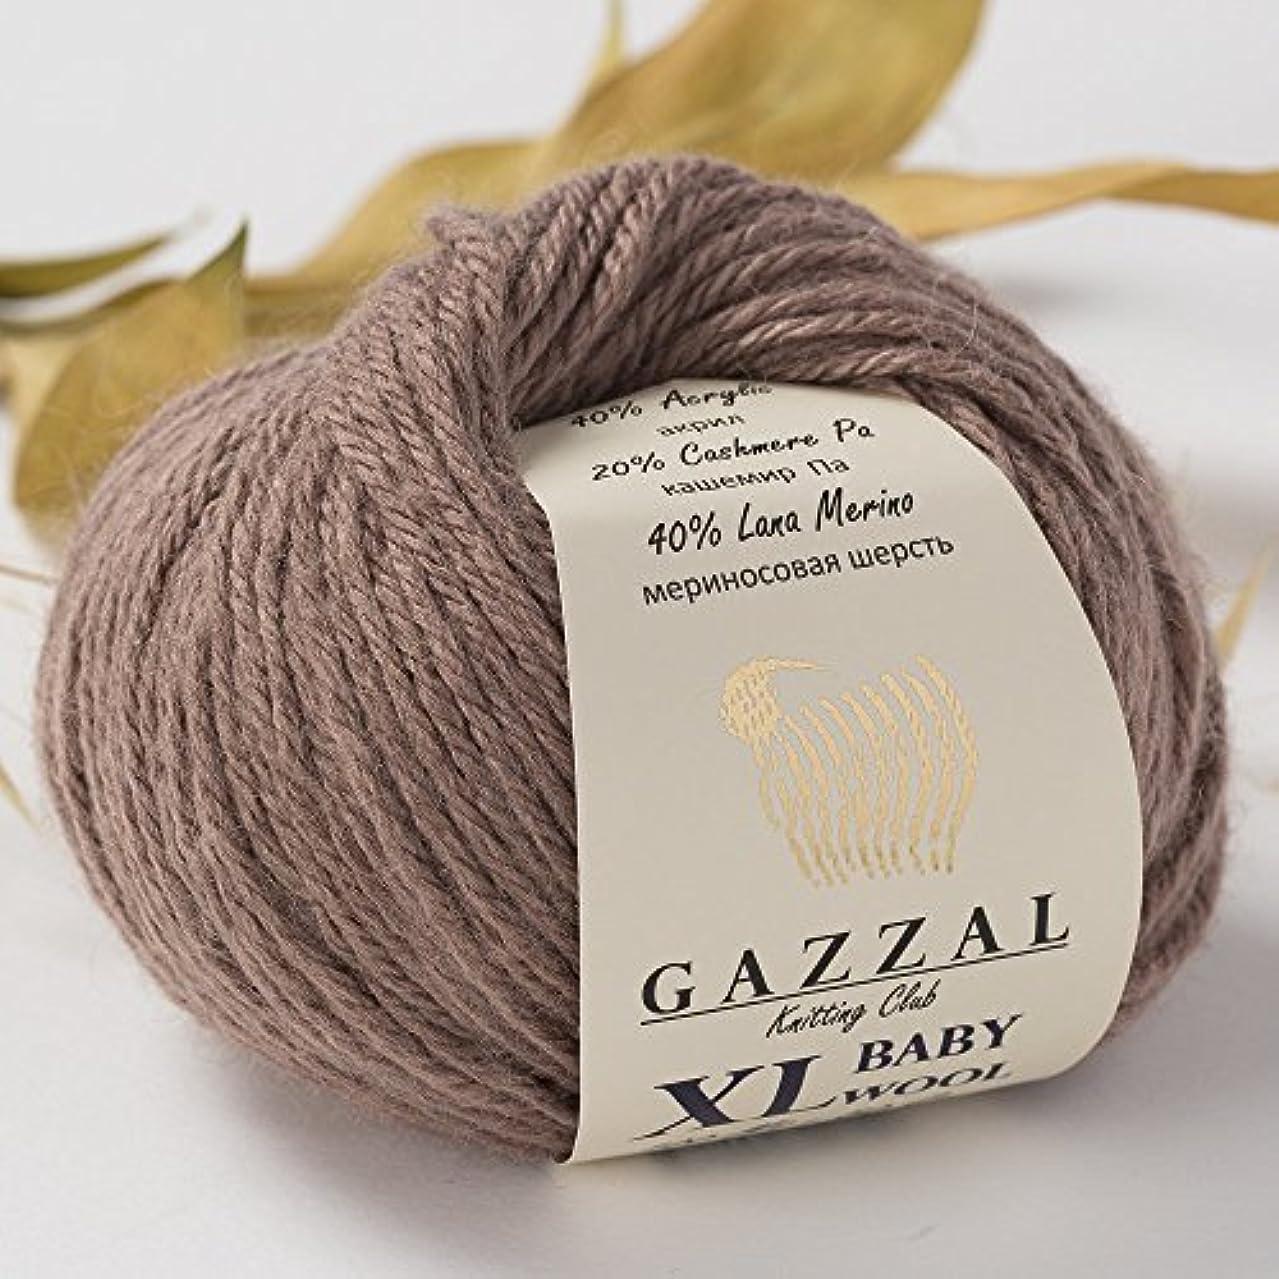 Gazzal 3 Pack (Ball) Baby Wool XL Total 5.28 Oz/328 Yrds, Each Ball 1.76 Oz (50g)/109 Yrds (100m) Super Soft, Medium-Worsted Yarn, 40% Lana Merino 20% Cashmere Type Polyamide, Brown - 835